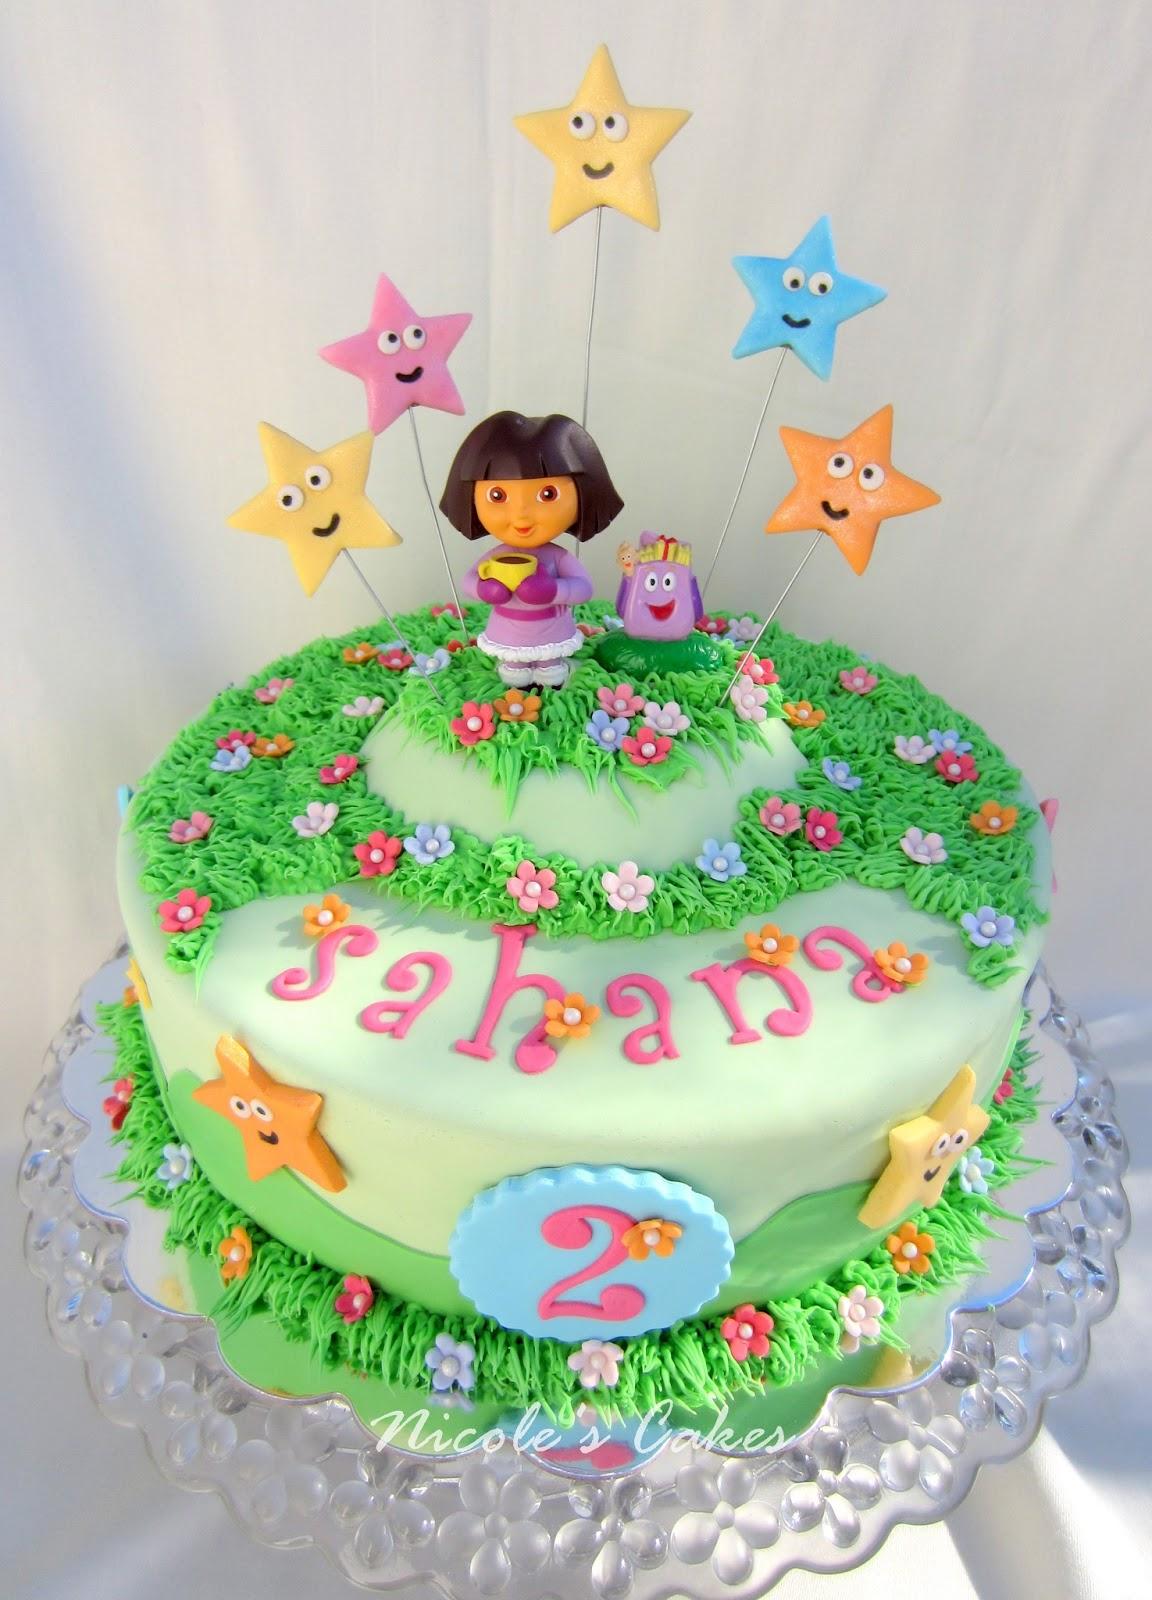 Confections, Cakes & Creations!: Dora The Explorer ...